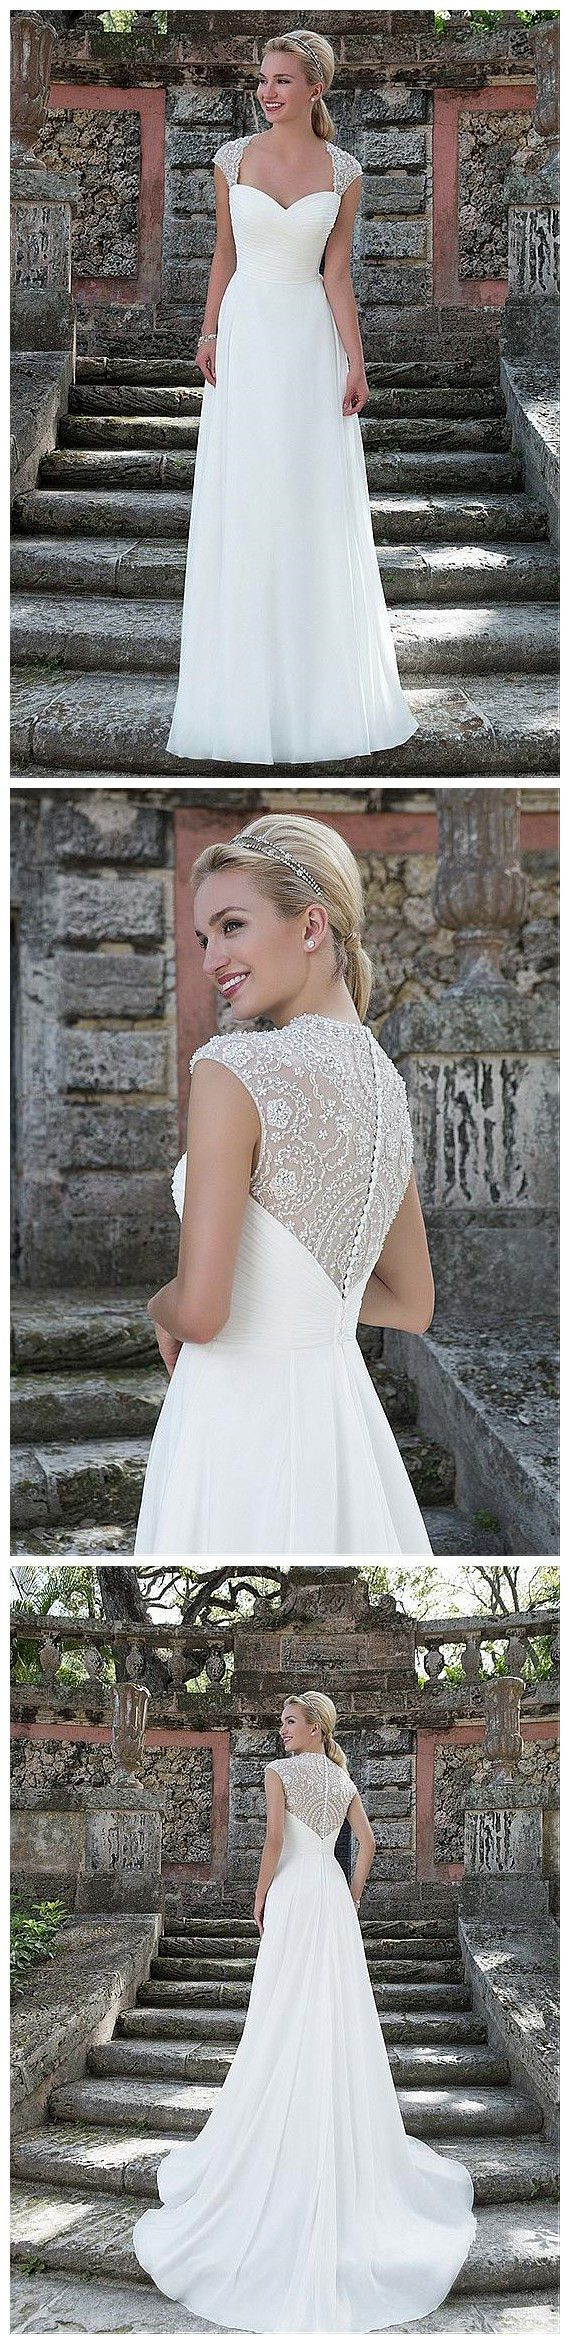 Lace wedding dress tulle november 2018 Brilliant Tulle u Chiffon Queen Anne Neckline Aline Wedding Dresses